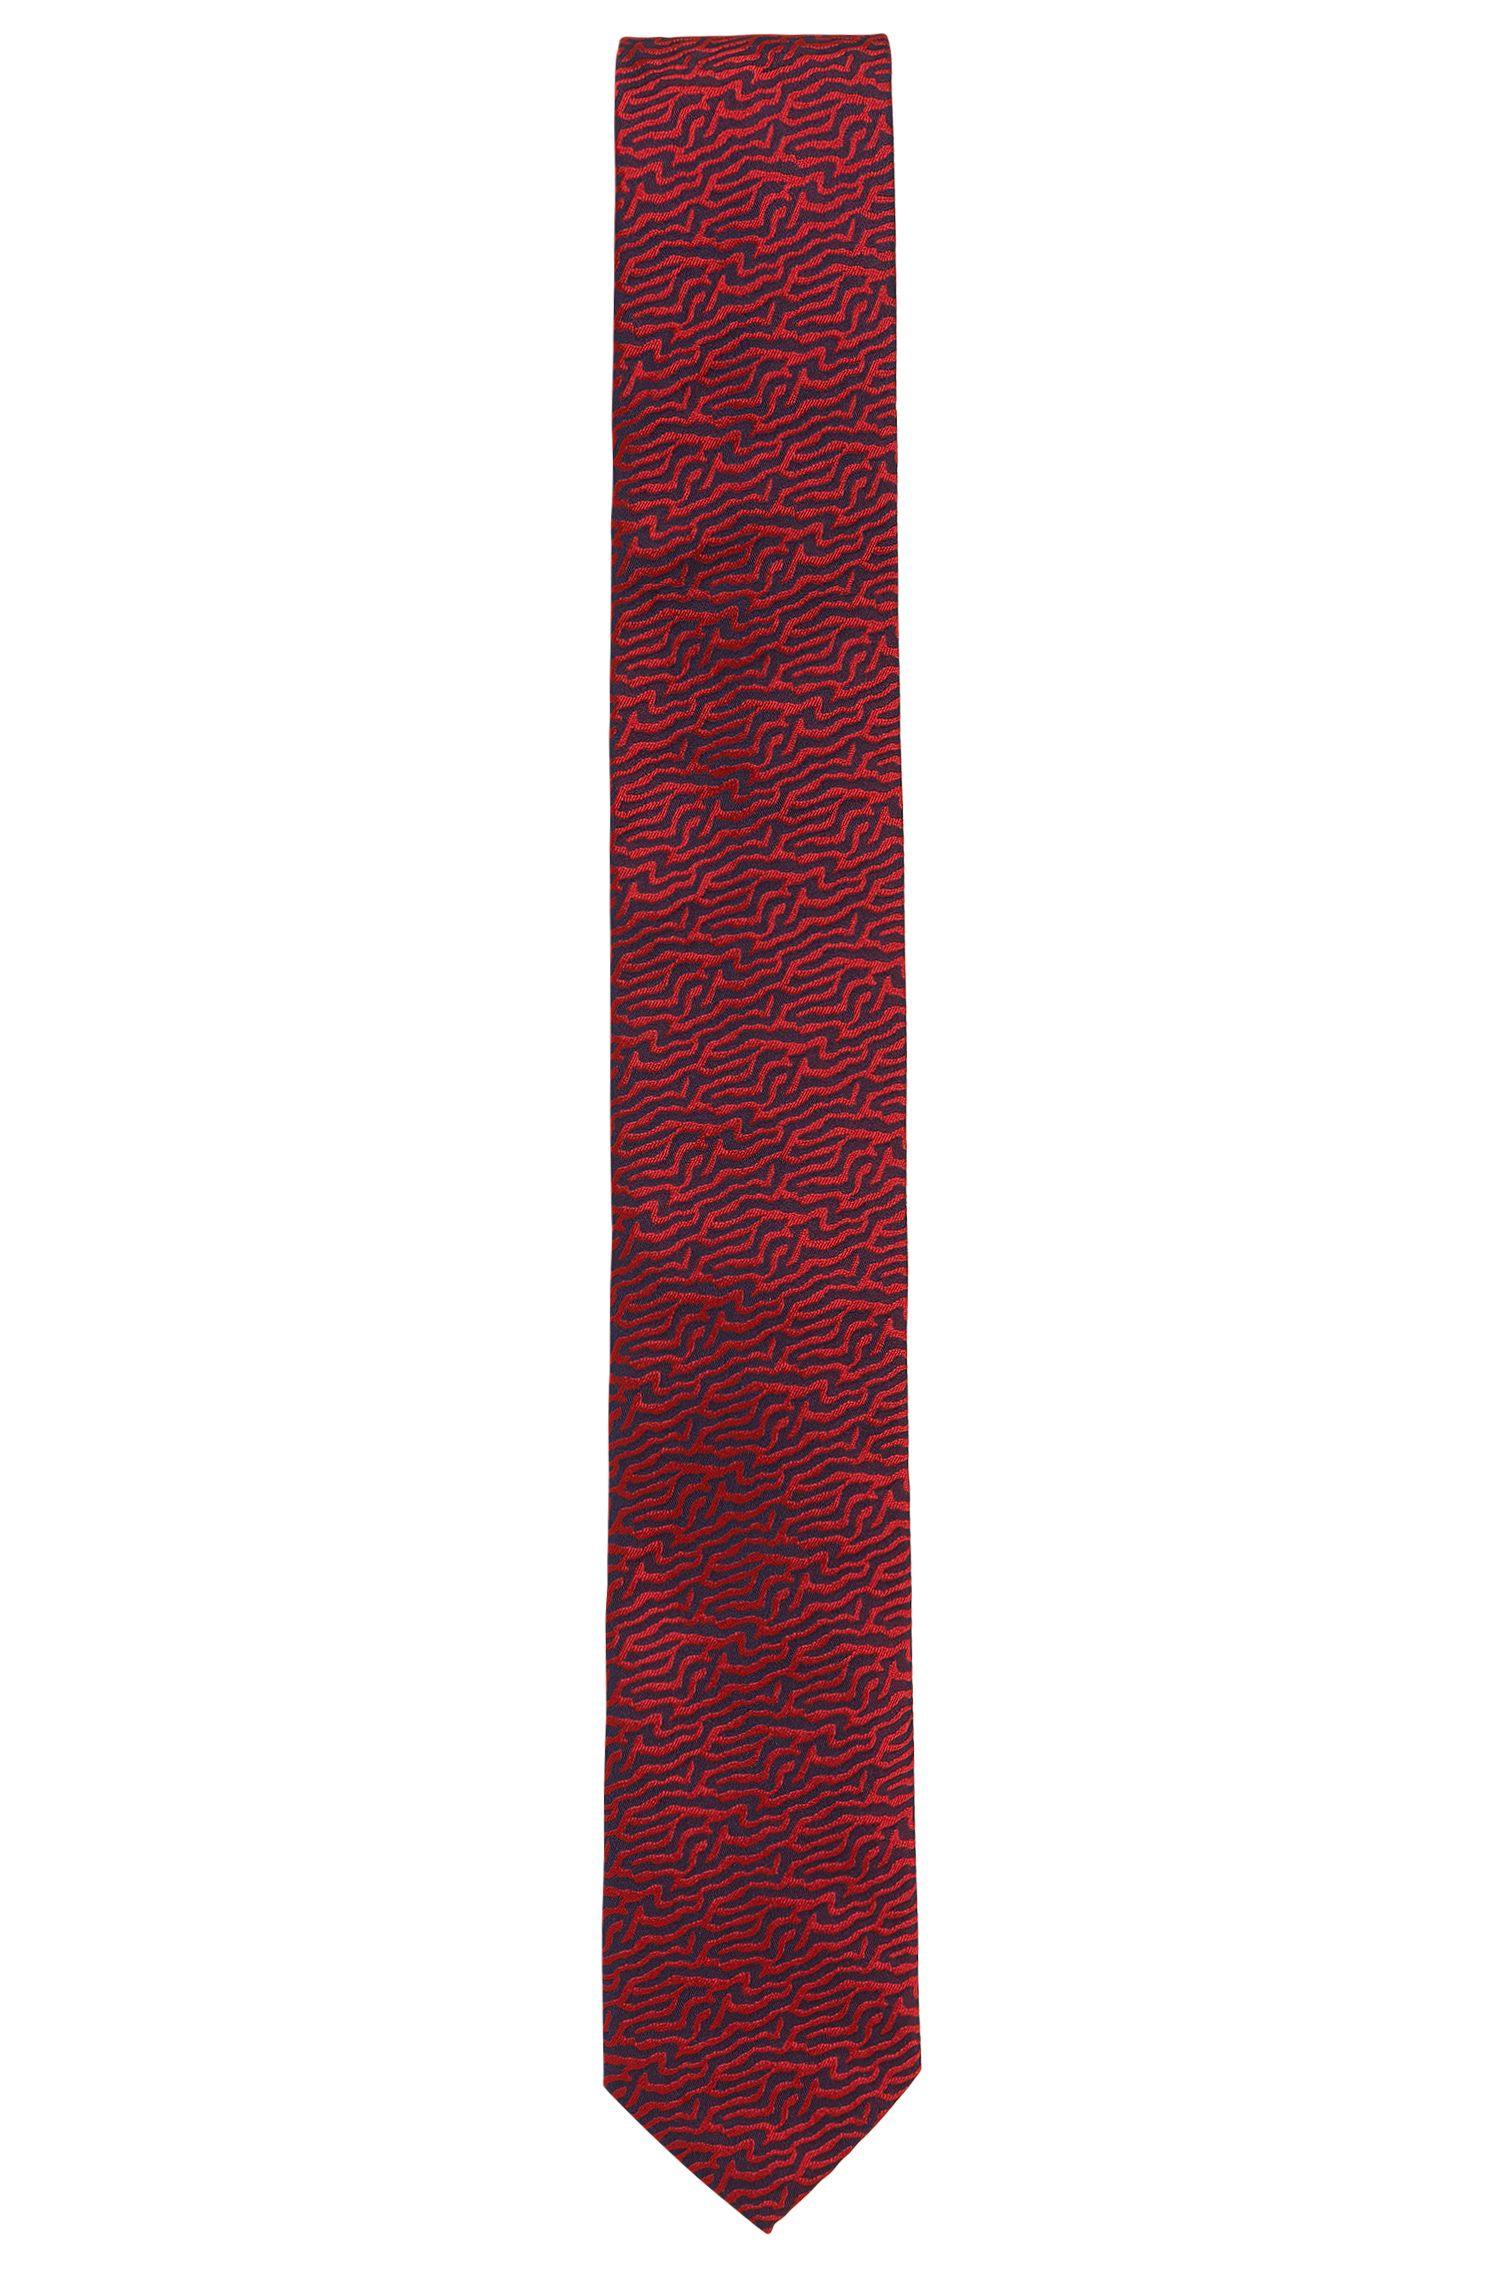 Jacquard stropdas van fijne zijde